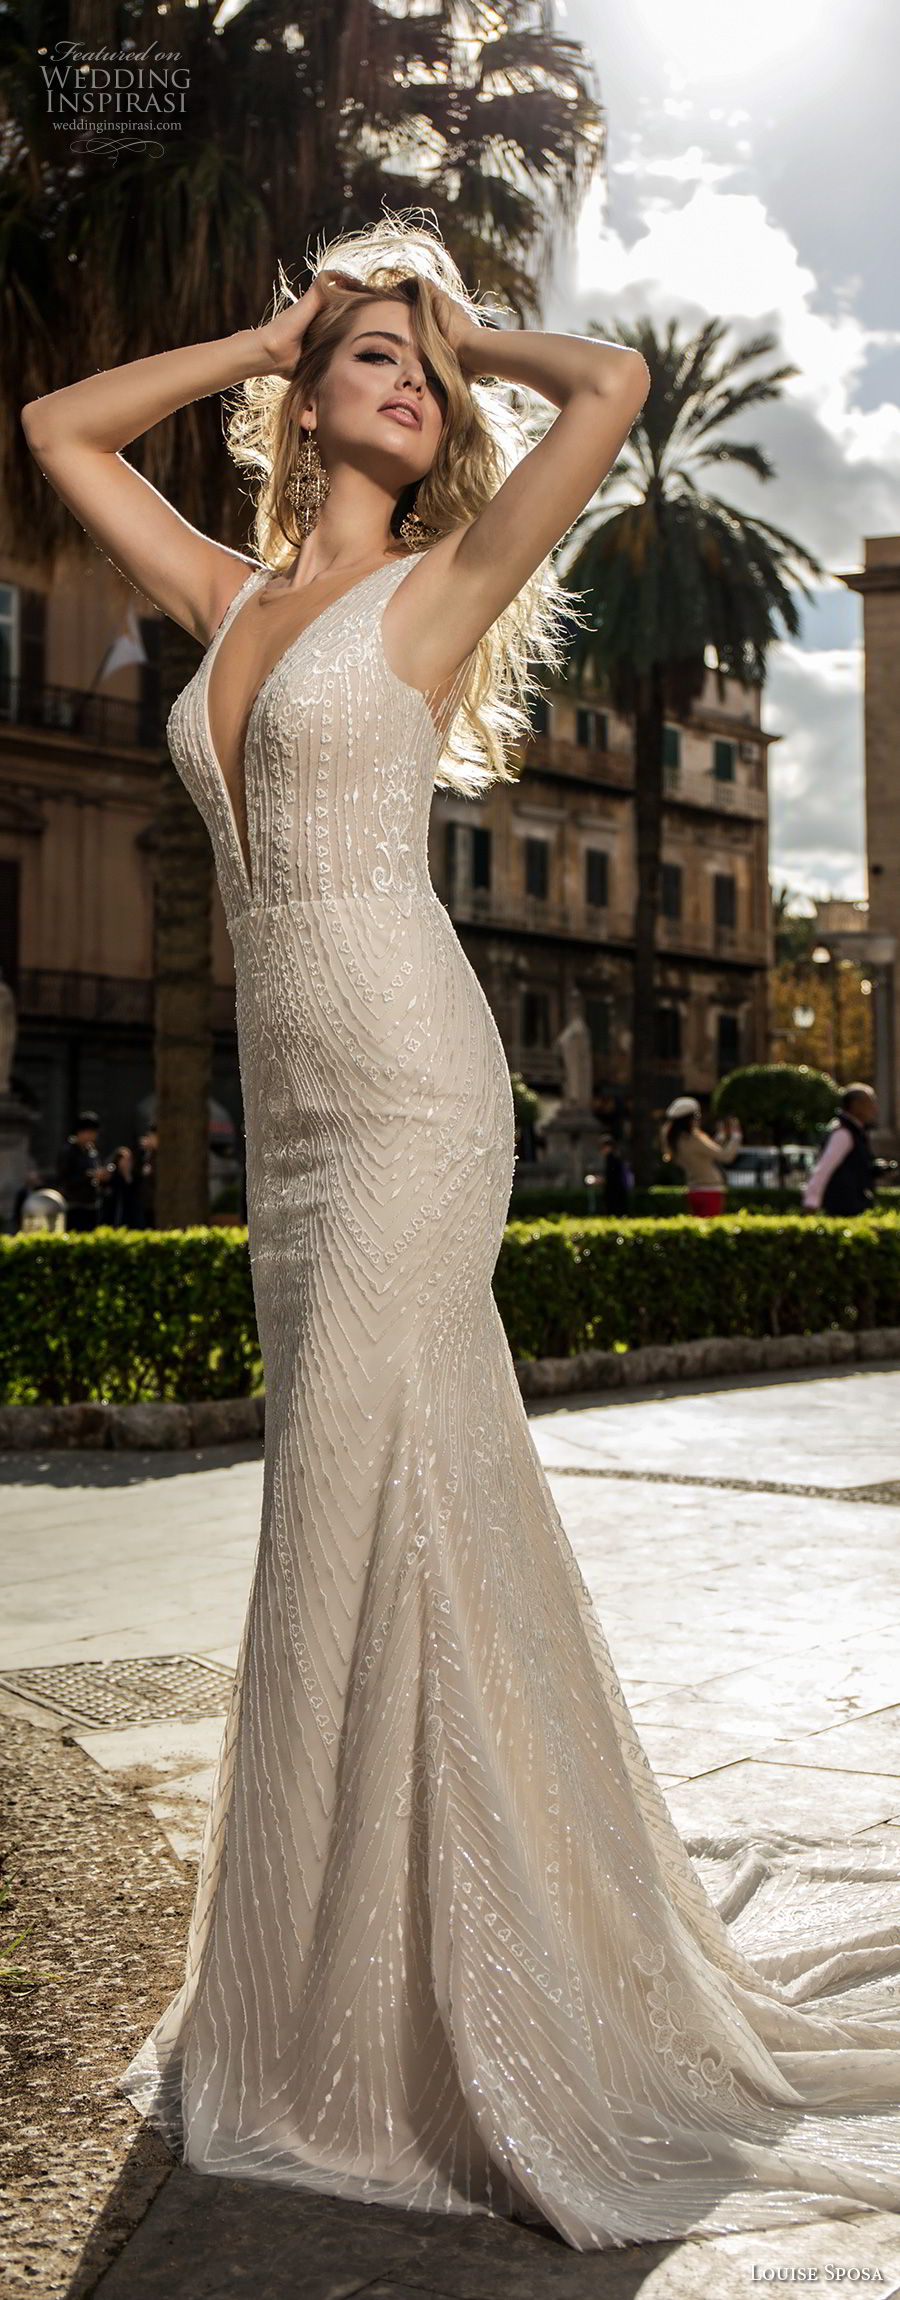 louise sposa 2018 bridal sleeveless with strap deep plunging v neck full embellishment fit and flare sheath wedding dress medium train (9) mv